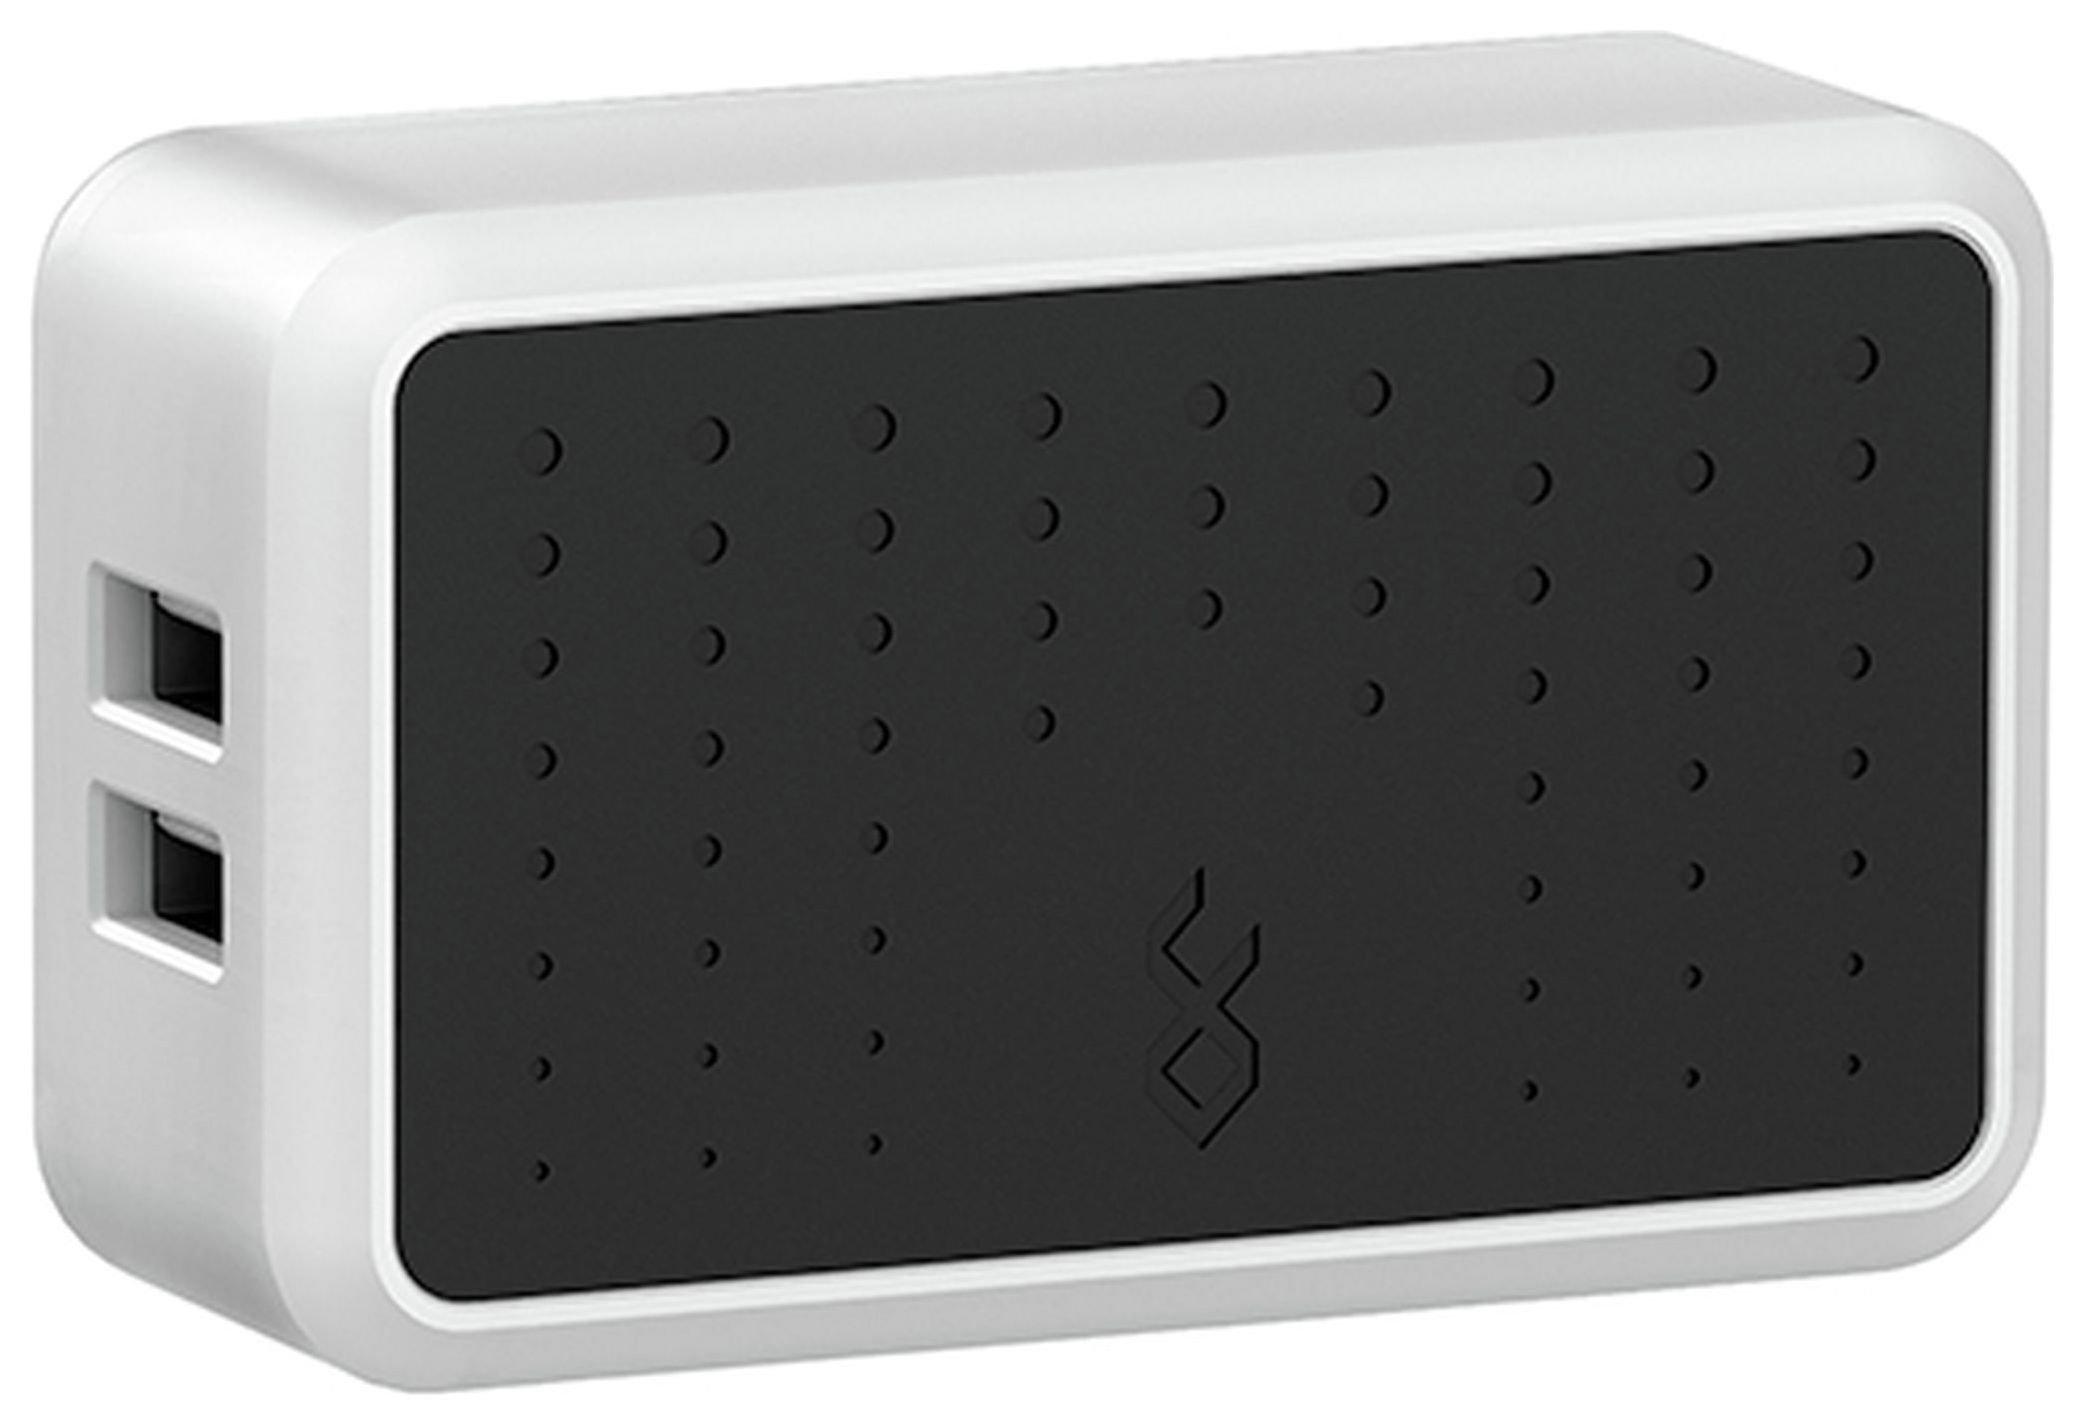 Image of BlueFlame 2 Port USB Wall Charger.